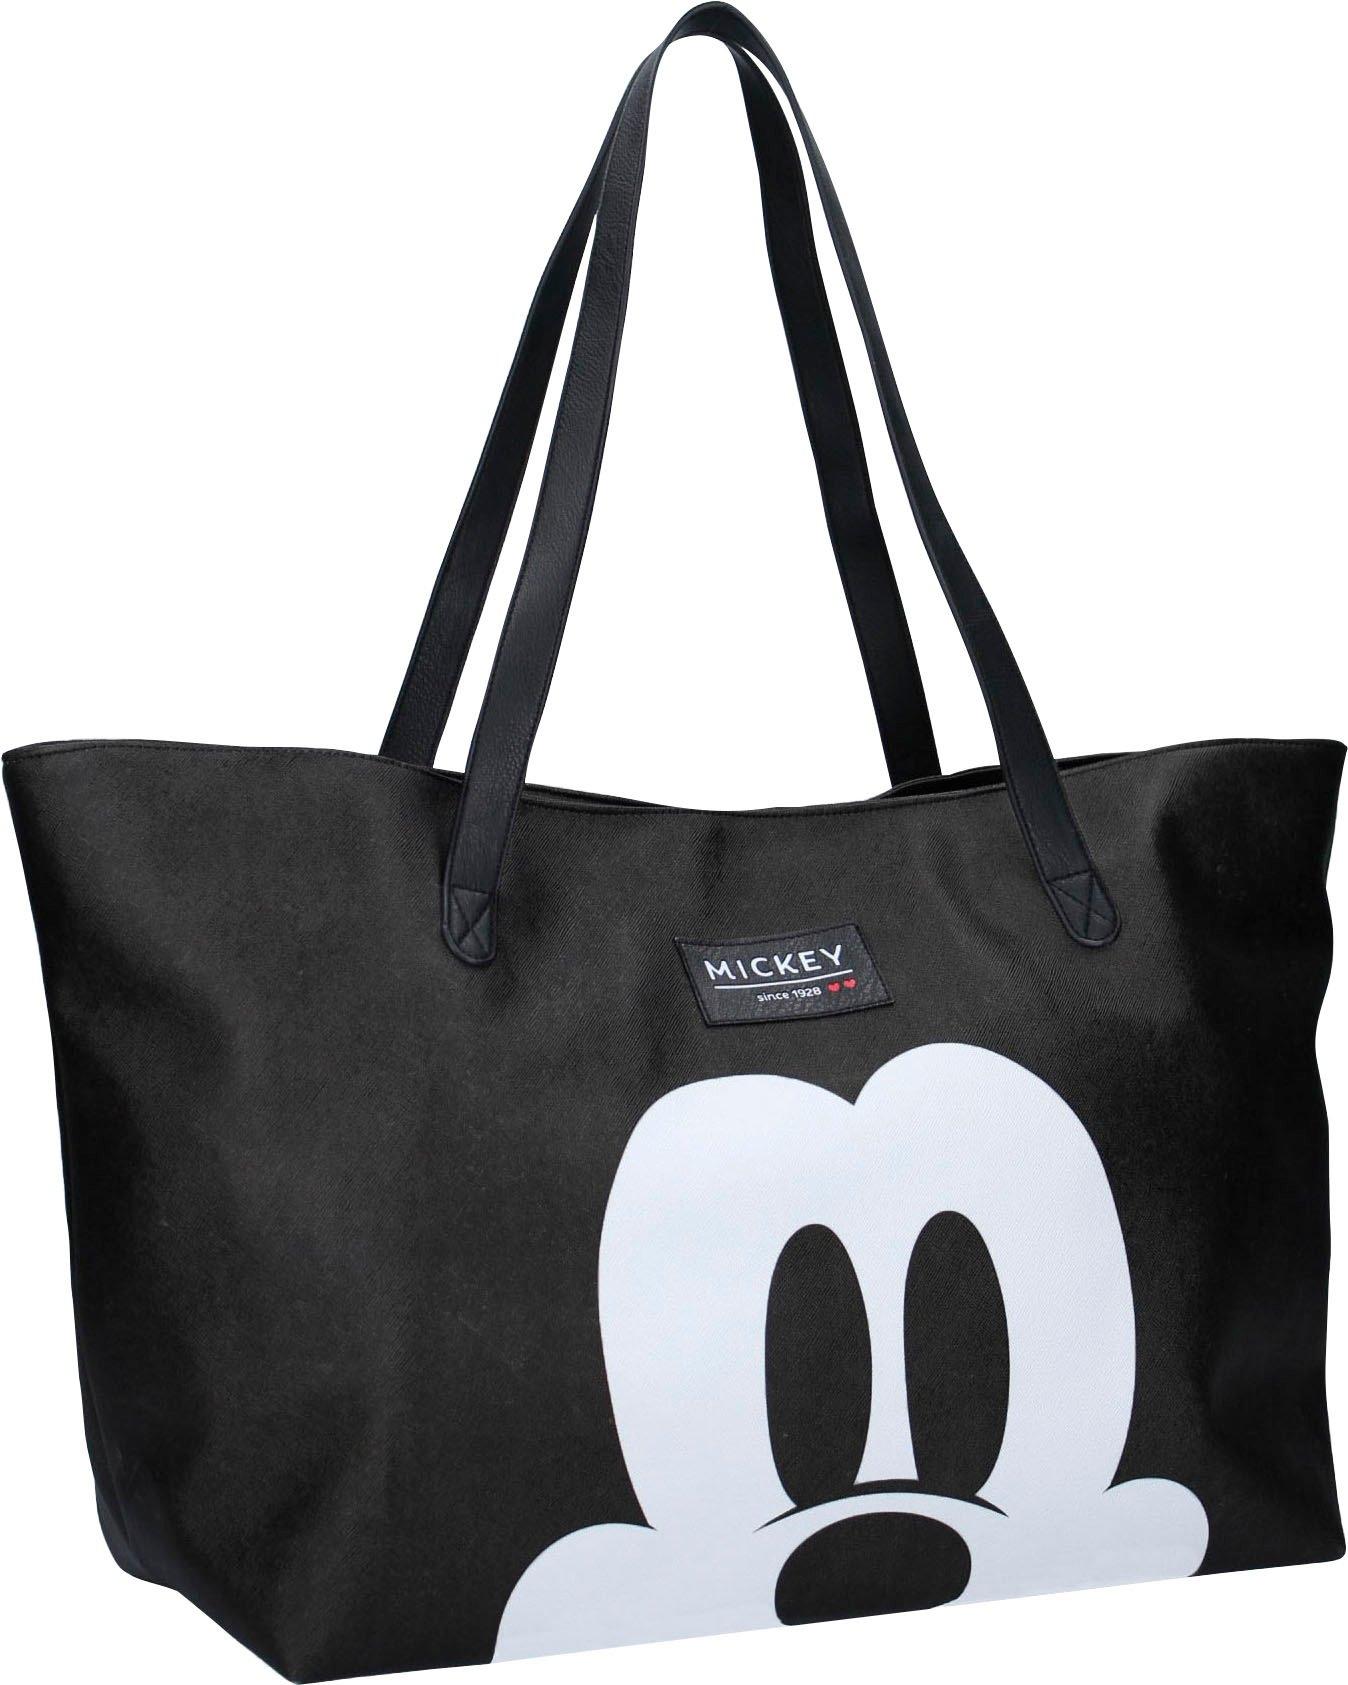 Vadobag schoudertas »Mickey Mouse Forever Famous« bij OTTO online kopen